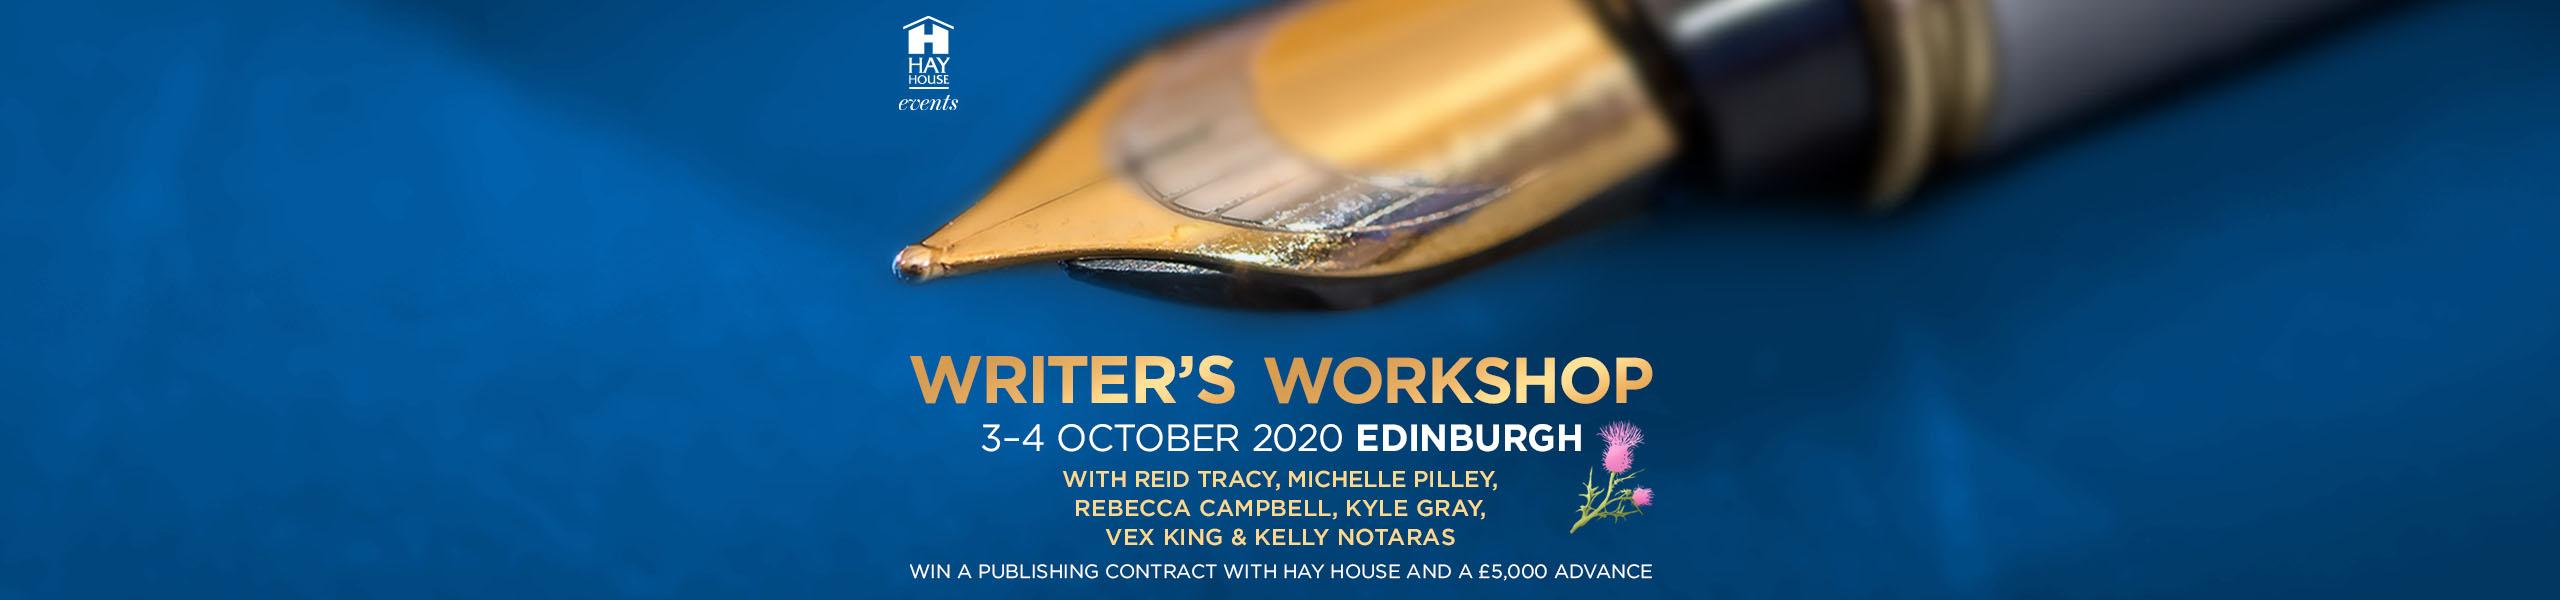 Writer's Workshop 2020 Edinburgh